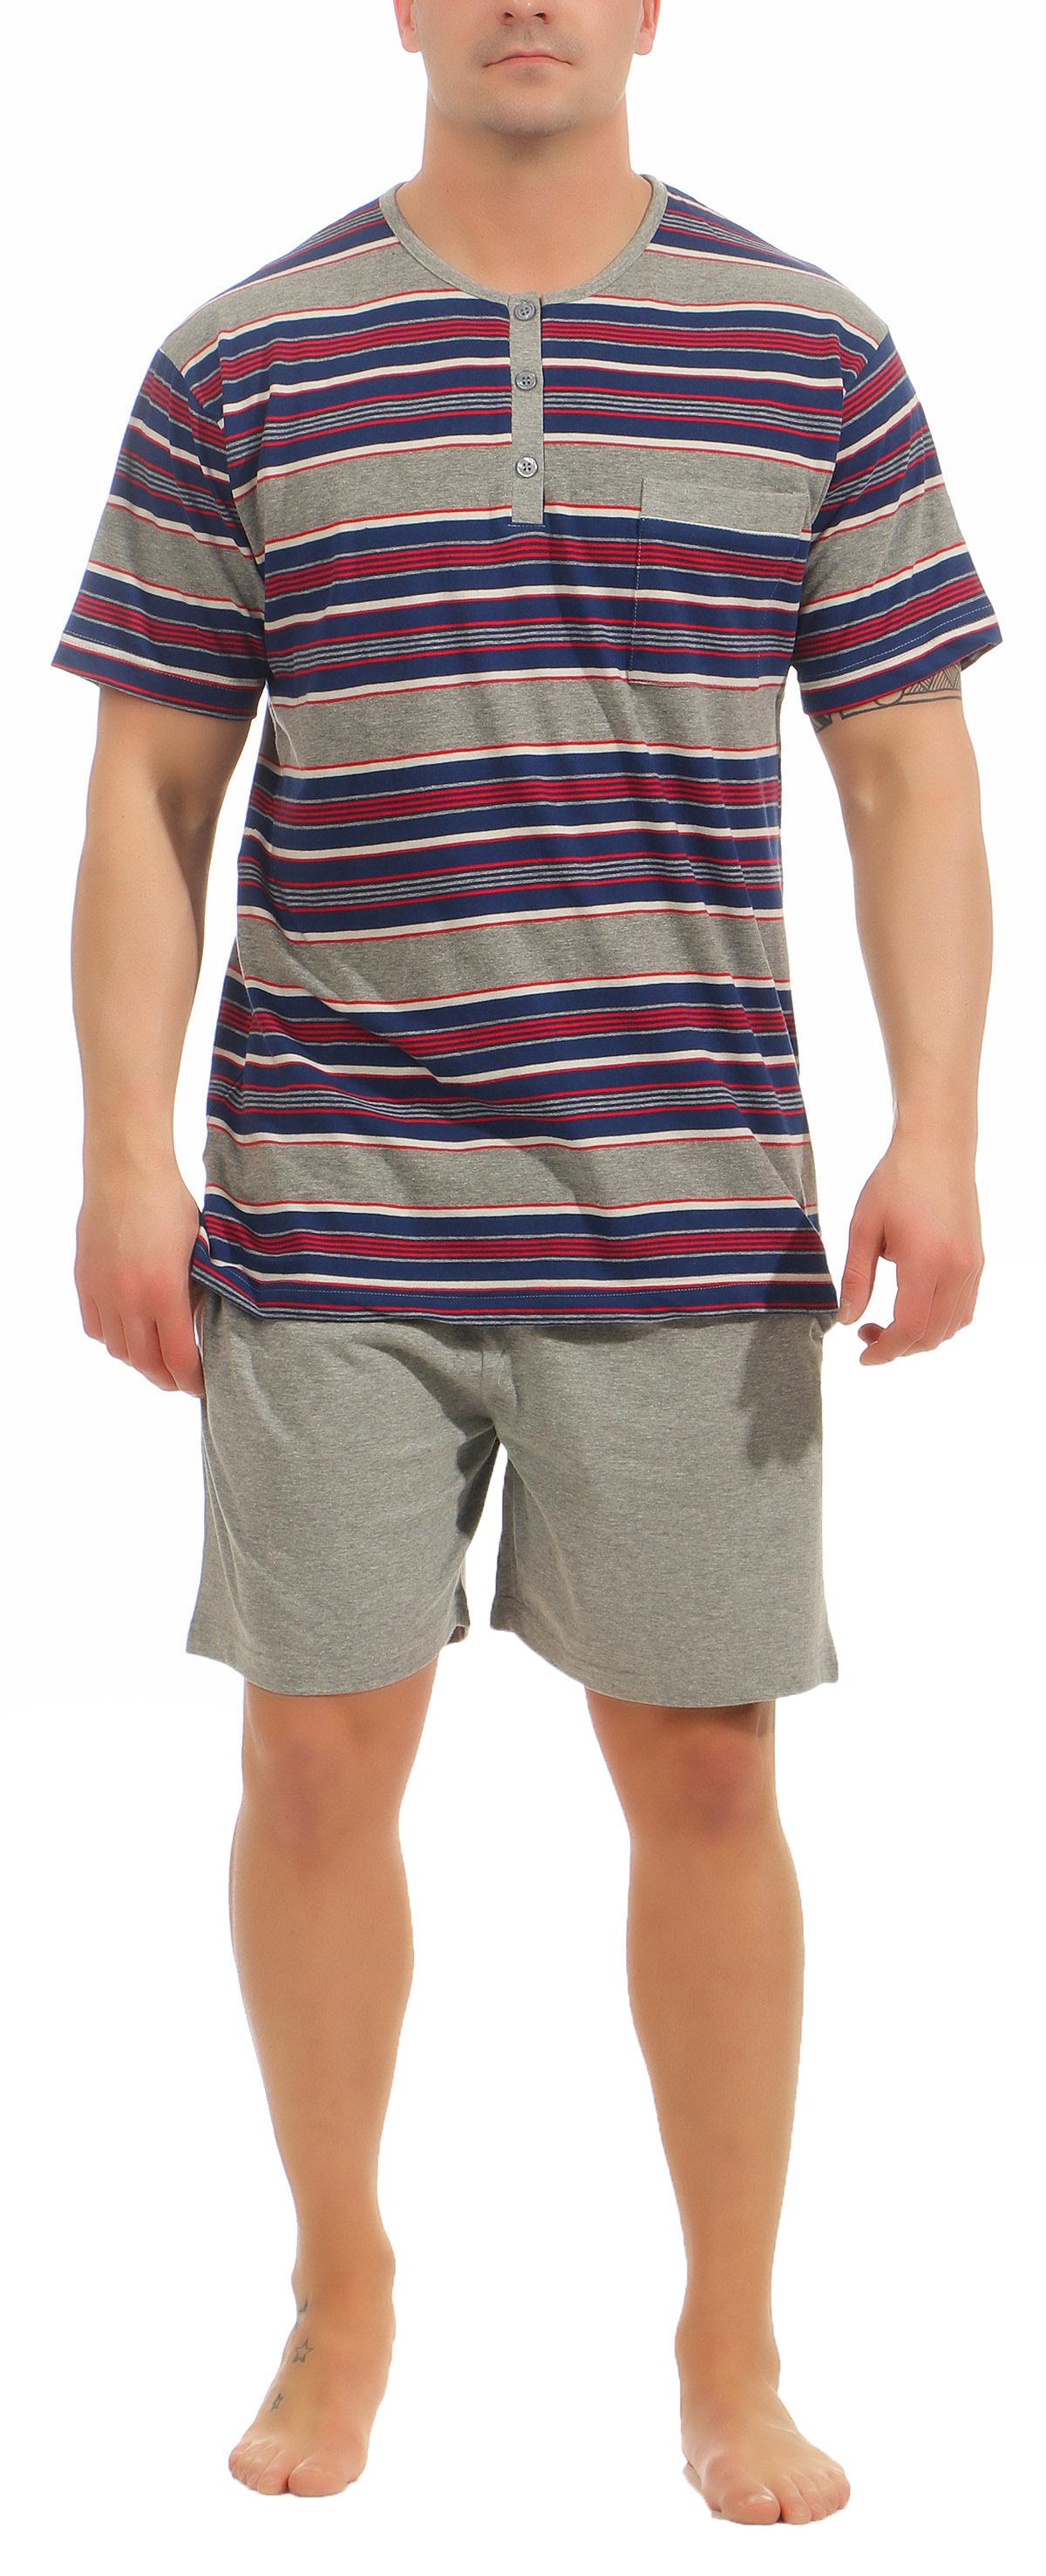 Eleganter Herren Shorty Pyjama kurzam von NORMANN – Streifenoptik - 105 90 532 – Bild 2